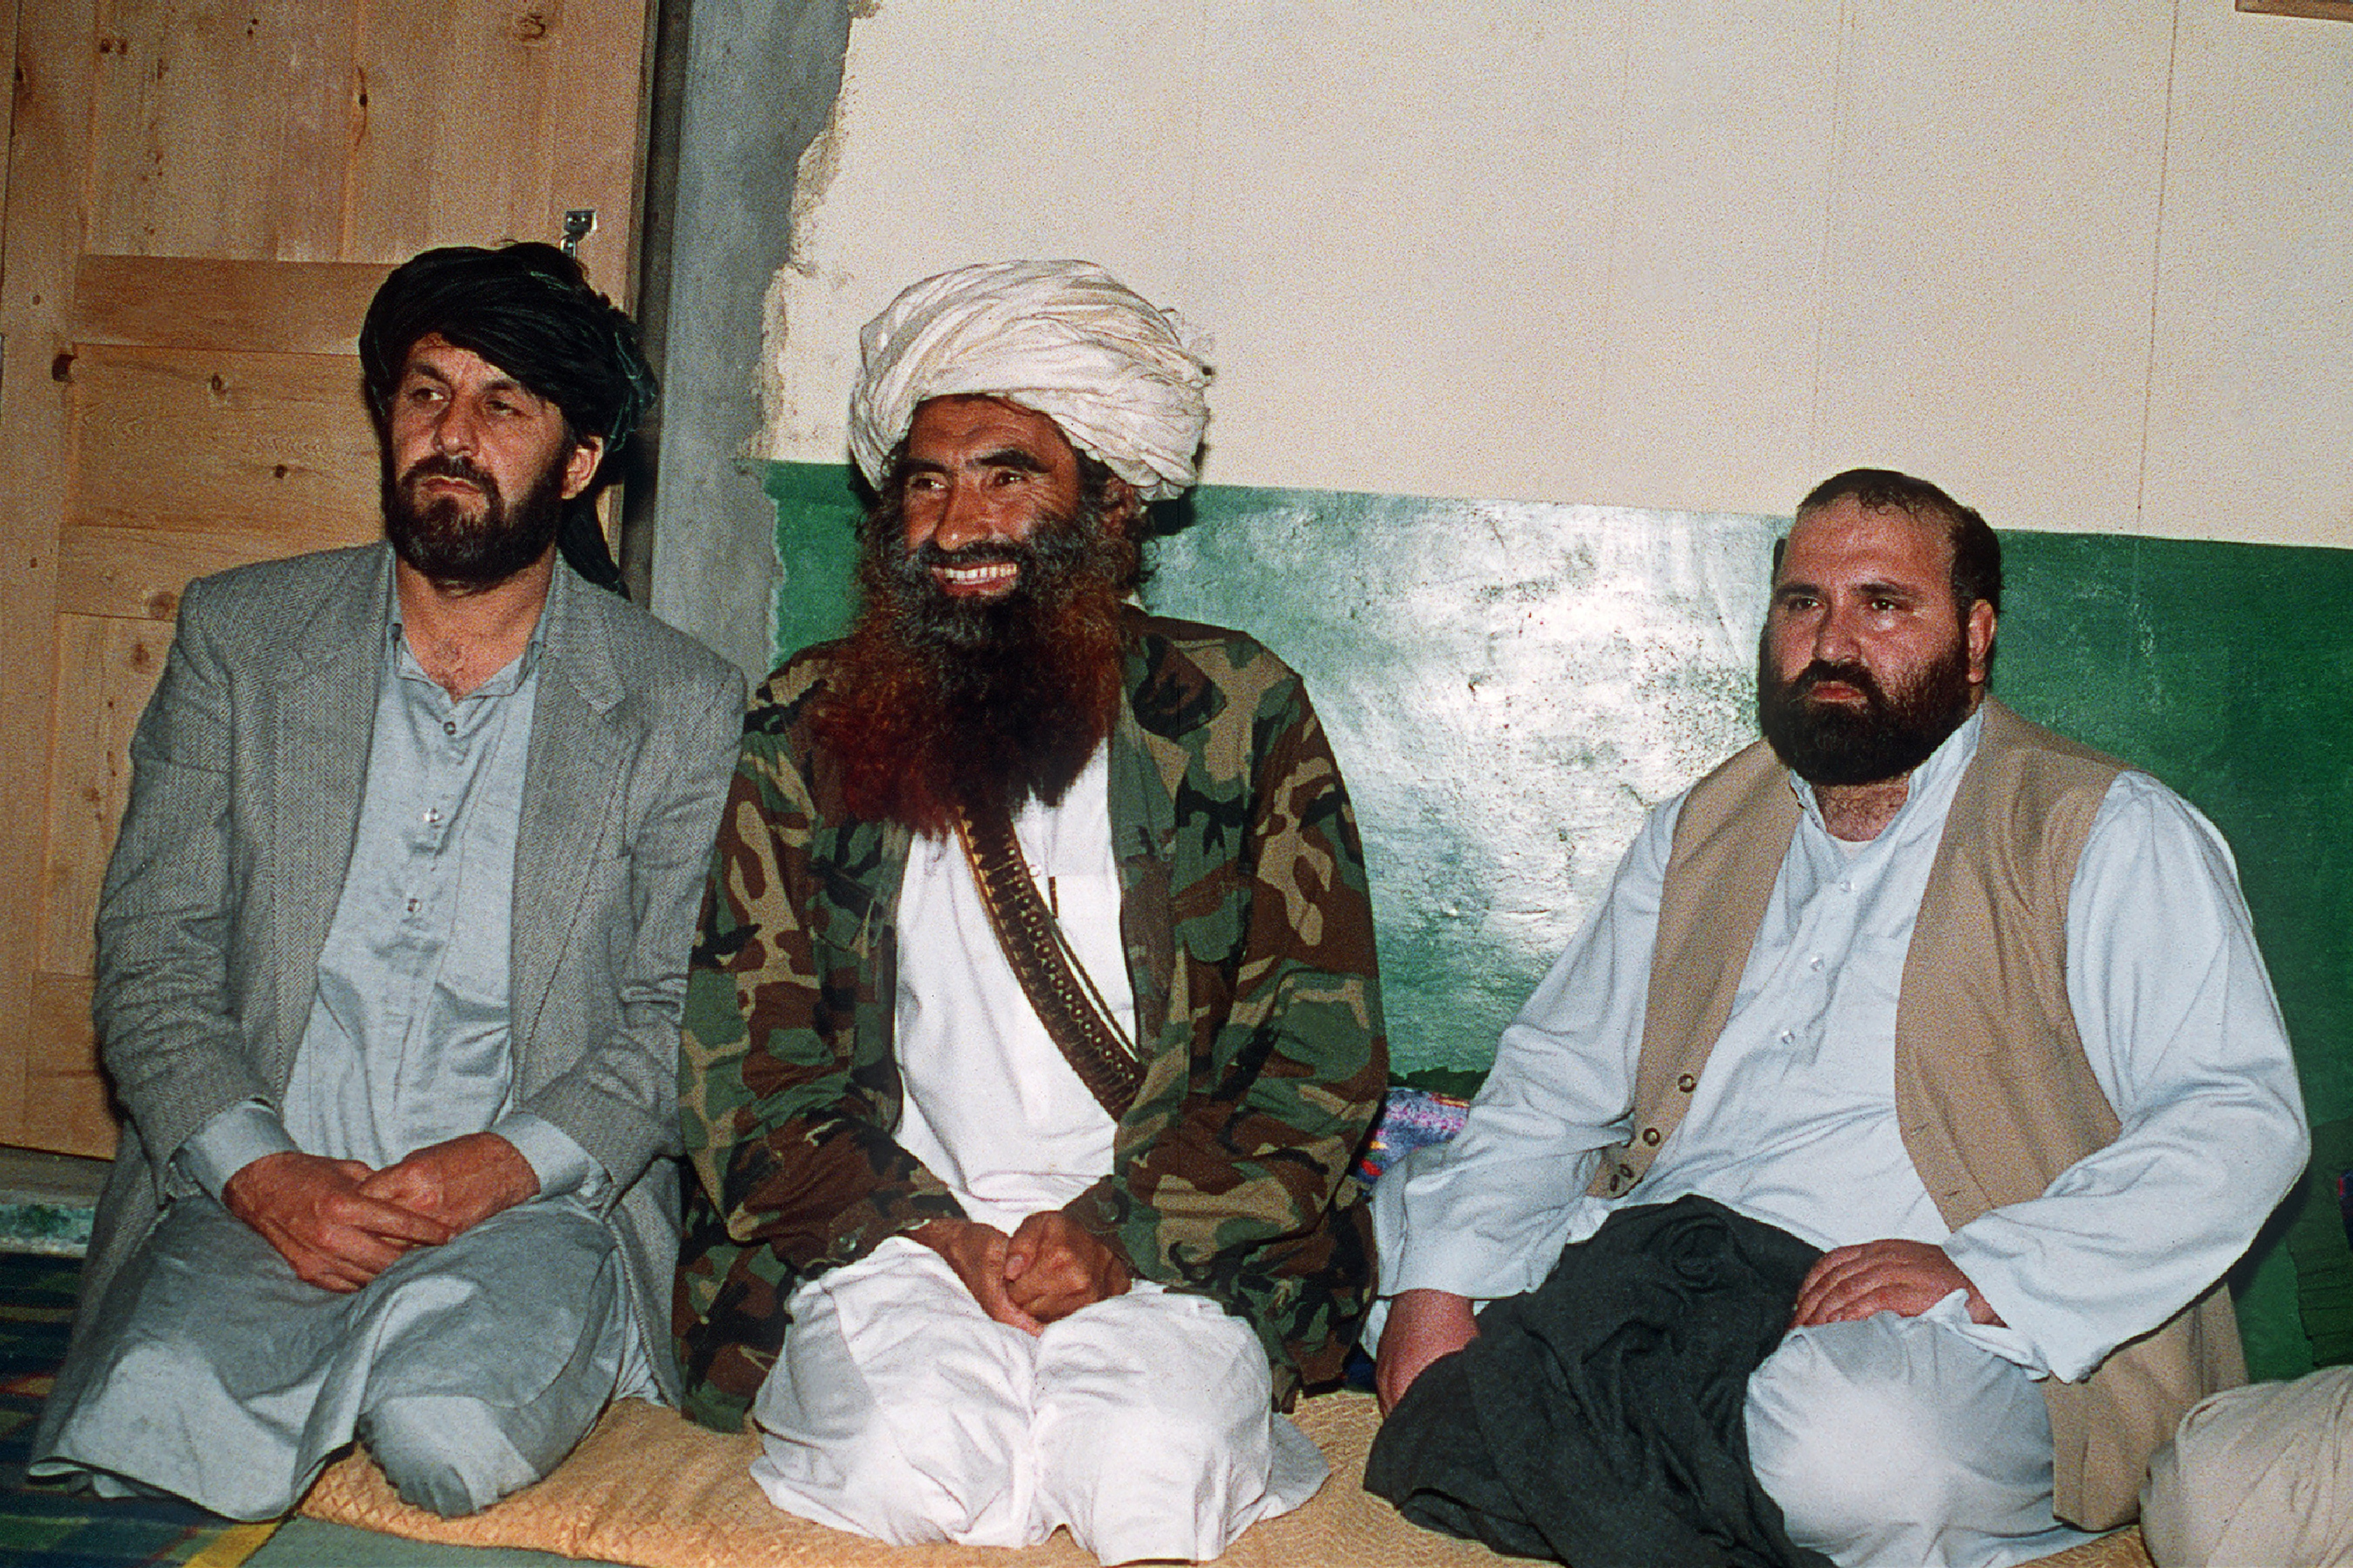 Haqqani Network founder dead after long illness: Afghan Taliban